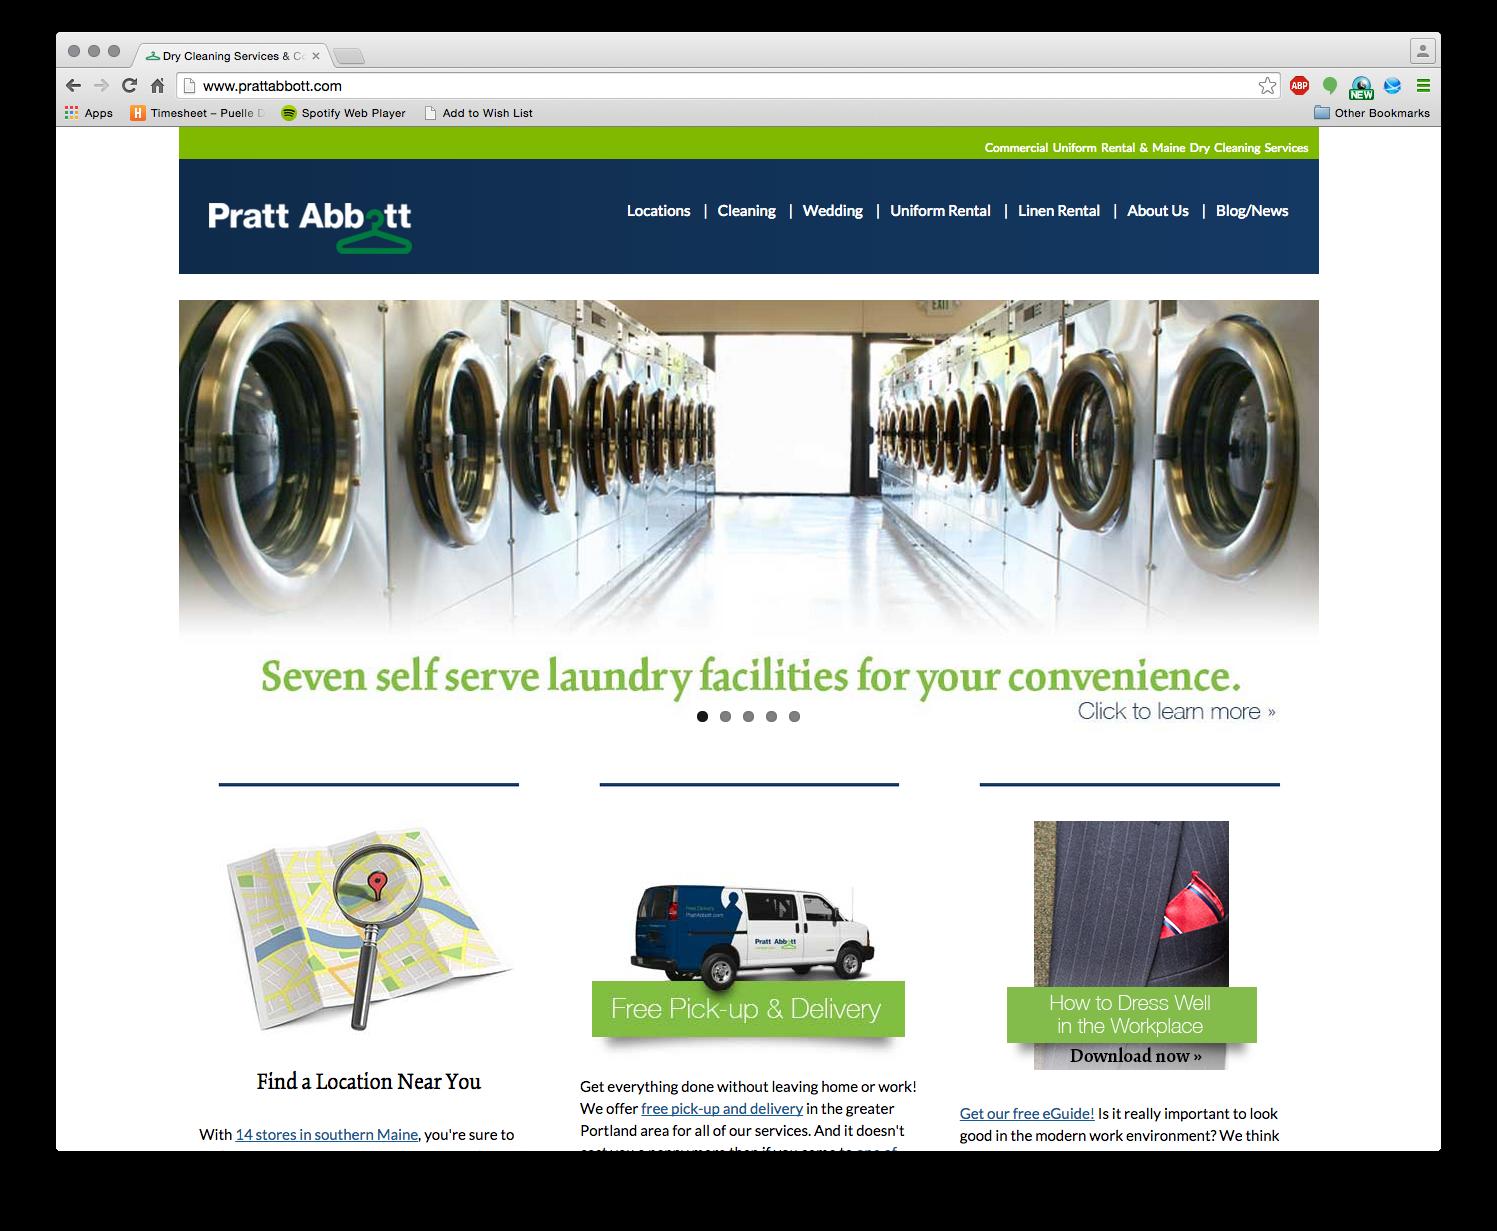 Pratt Abbott Website